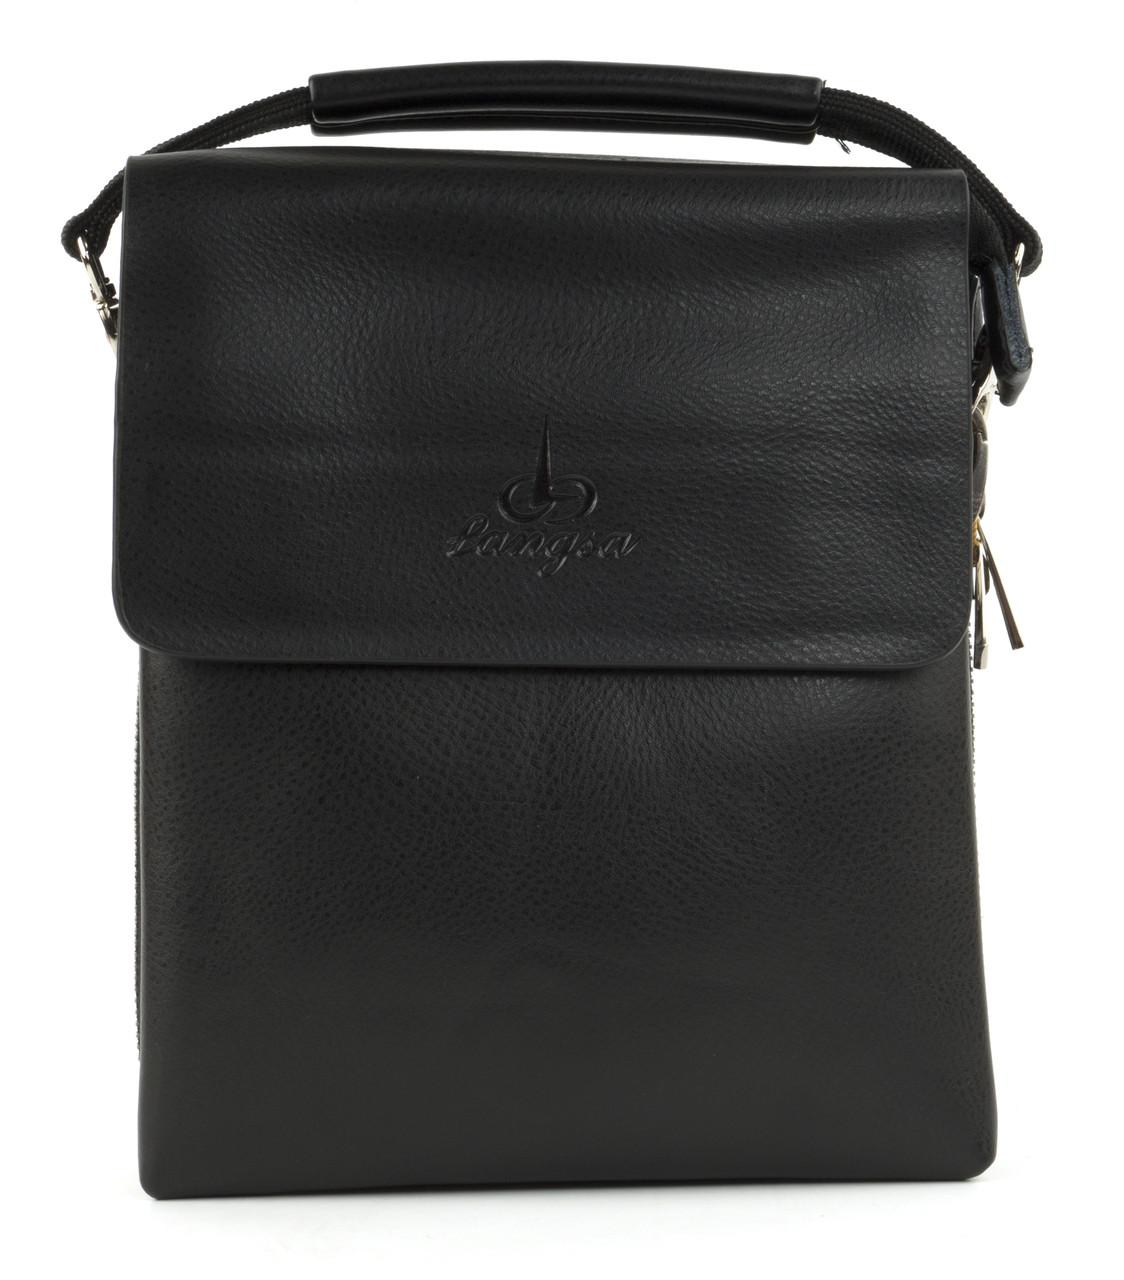 Зручна чоловіча стильна сумка Langsa art. 6738-2 чорний